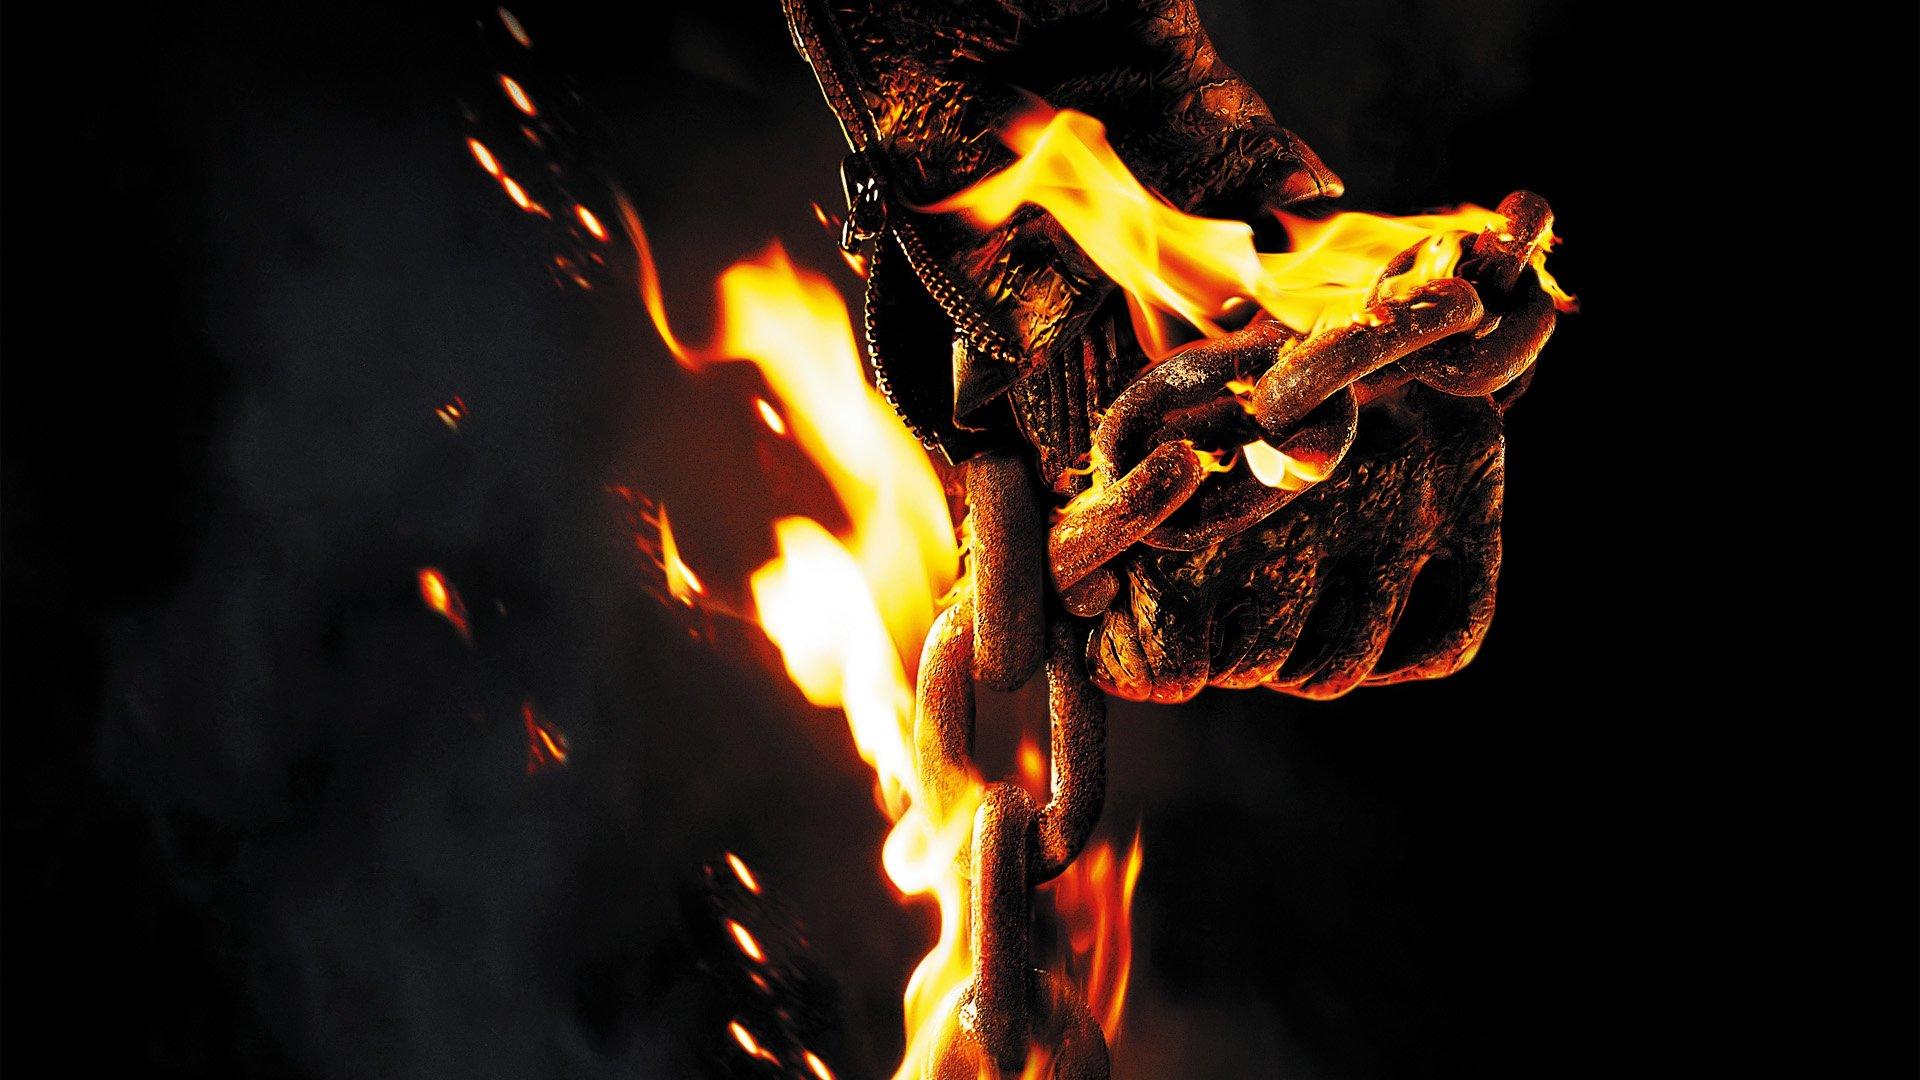 Ghost Rider La Tortura Fondo De Pantalla Hd Fondo De